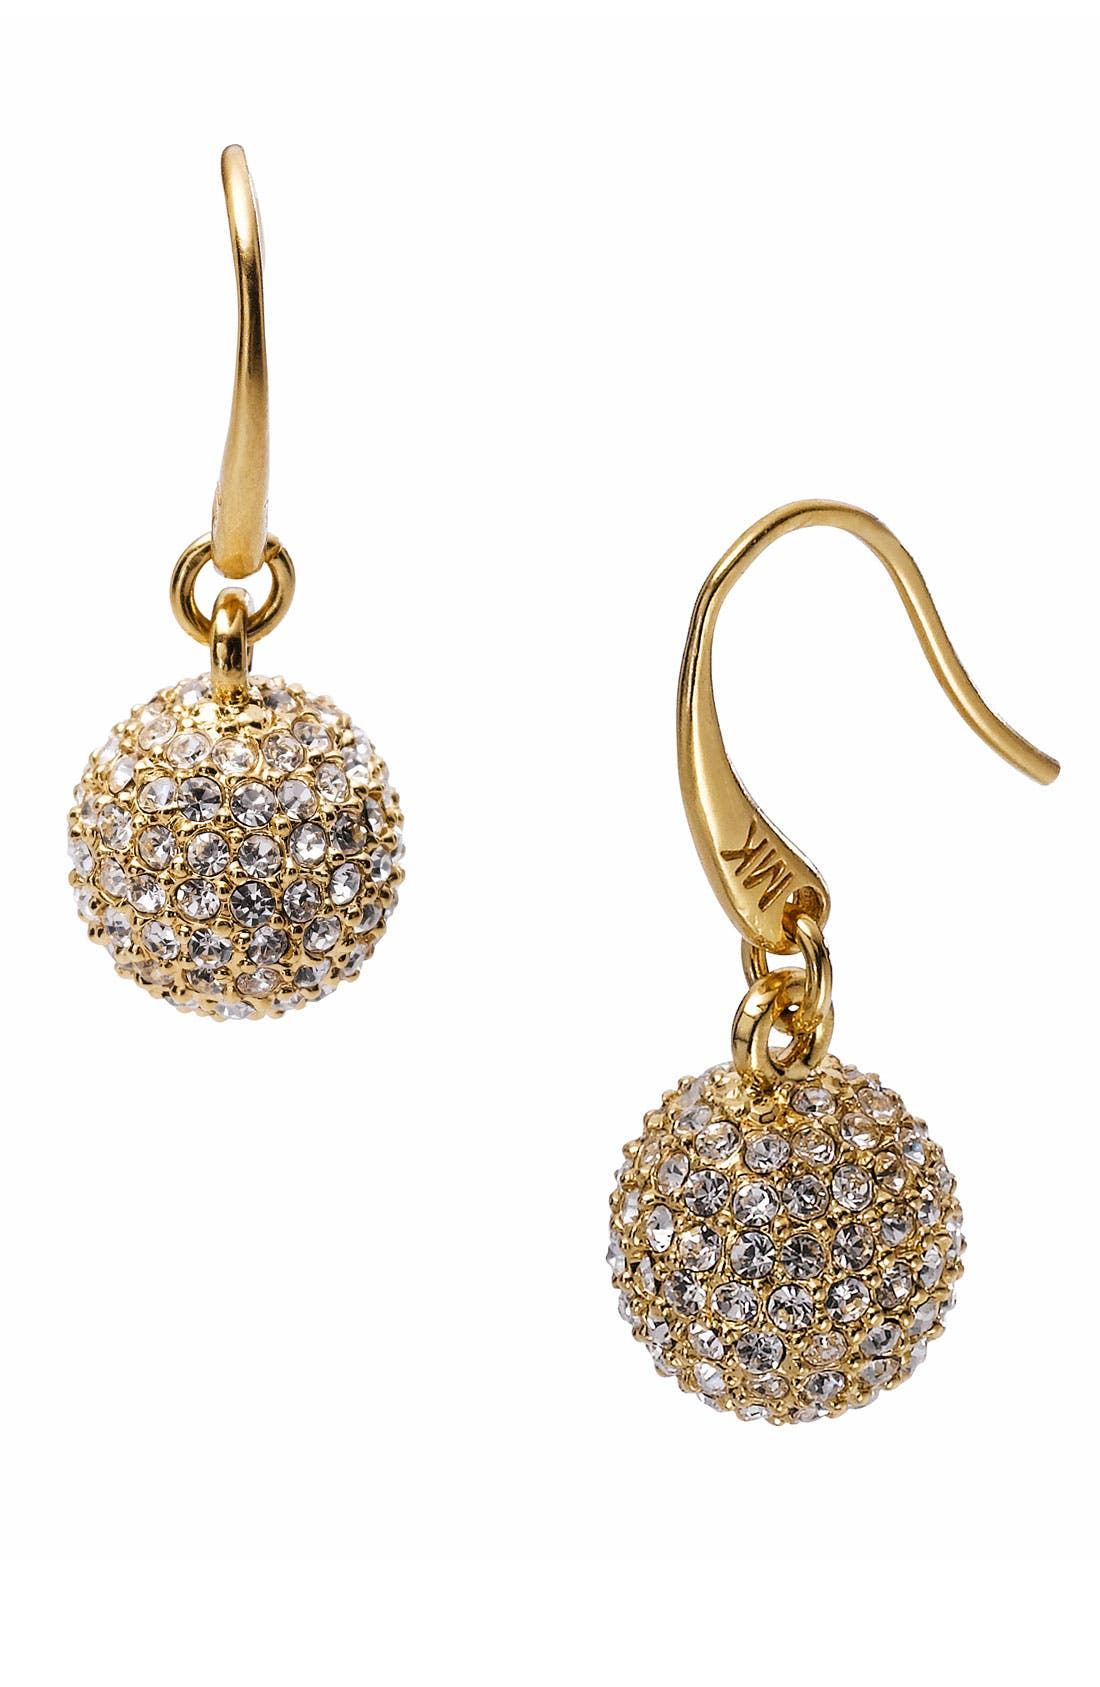 Main Image - Michael Kors 'Spring Sparkle' Pavé Ball Drop Earrings